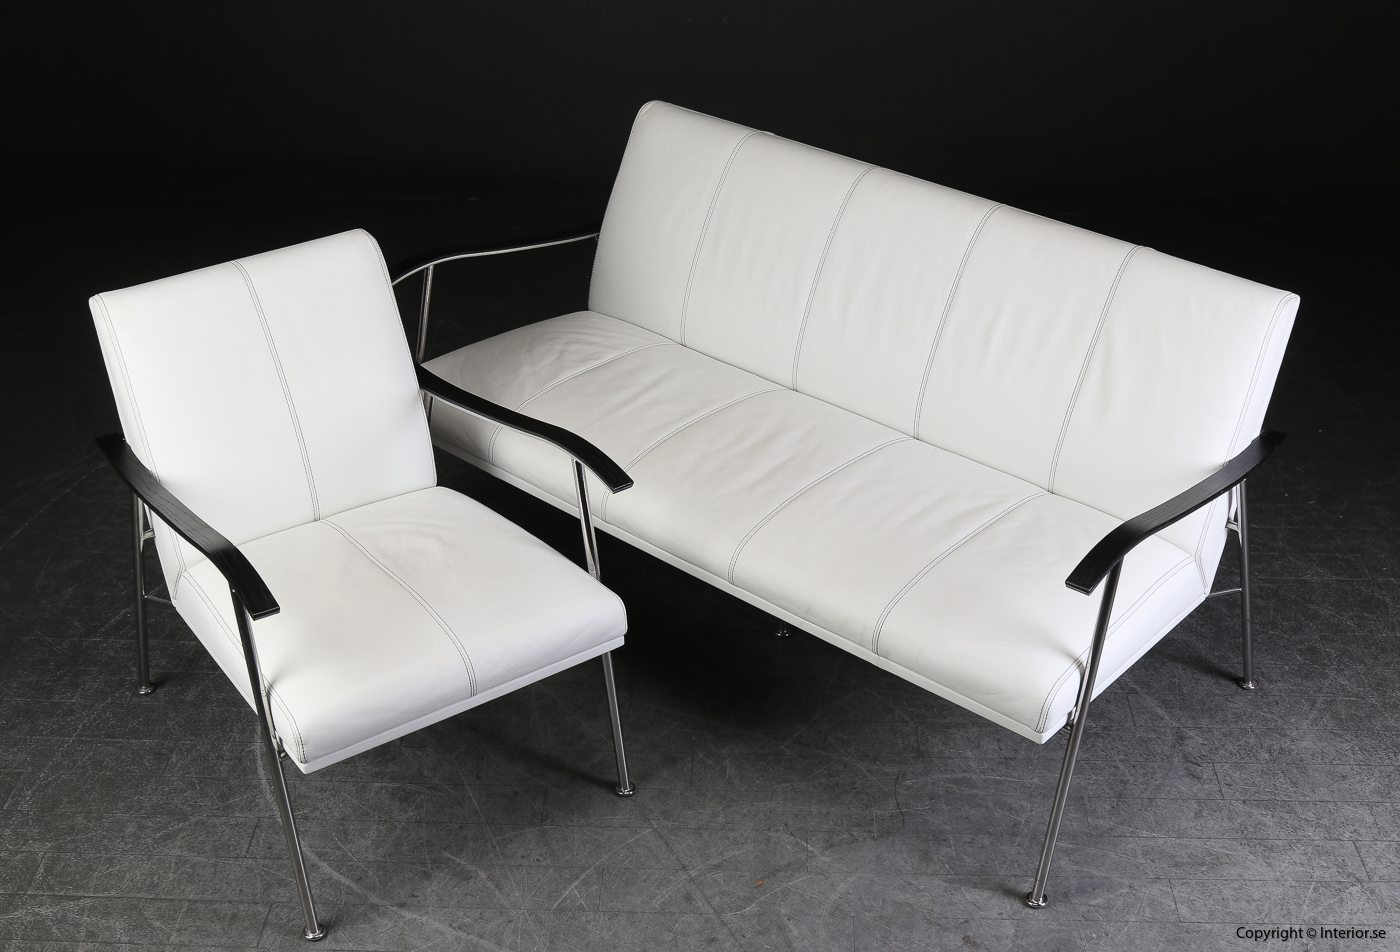 Soffgrupp armchair sofa, Lammhults Sahara i skinn - Gunilla Allard 2